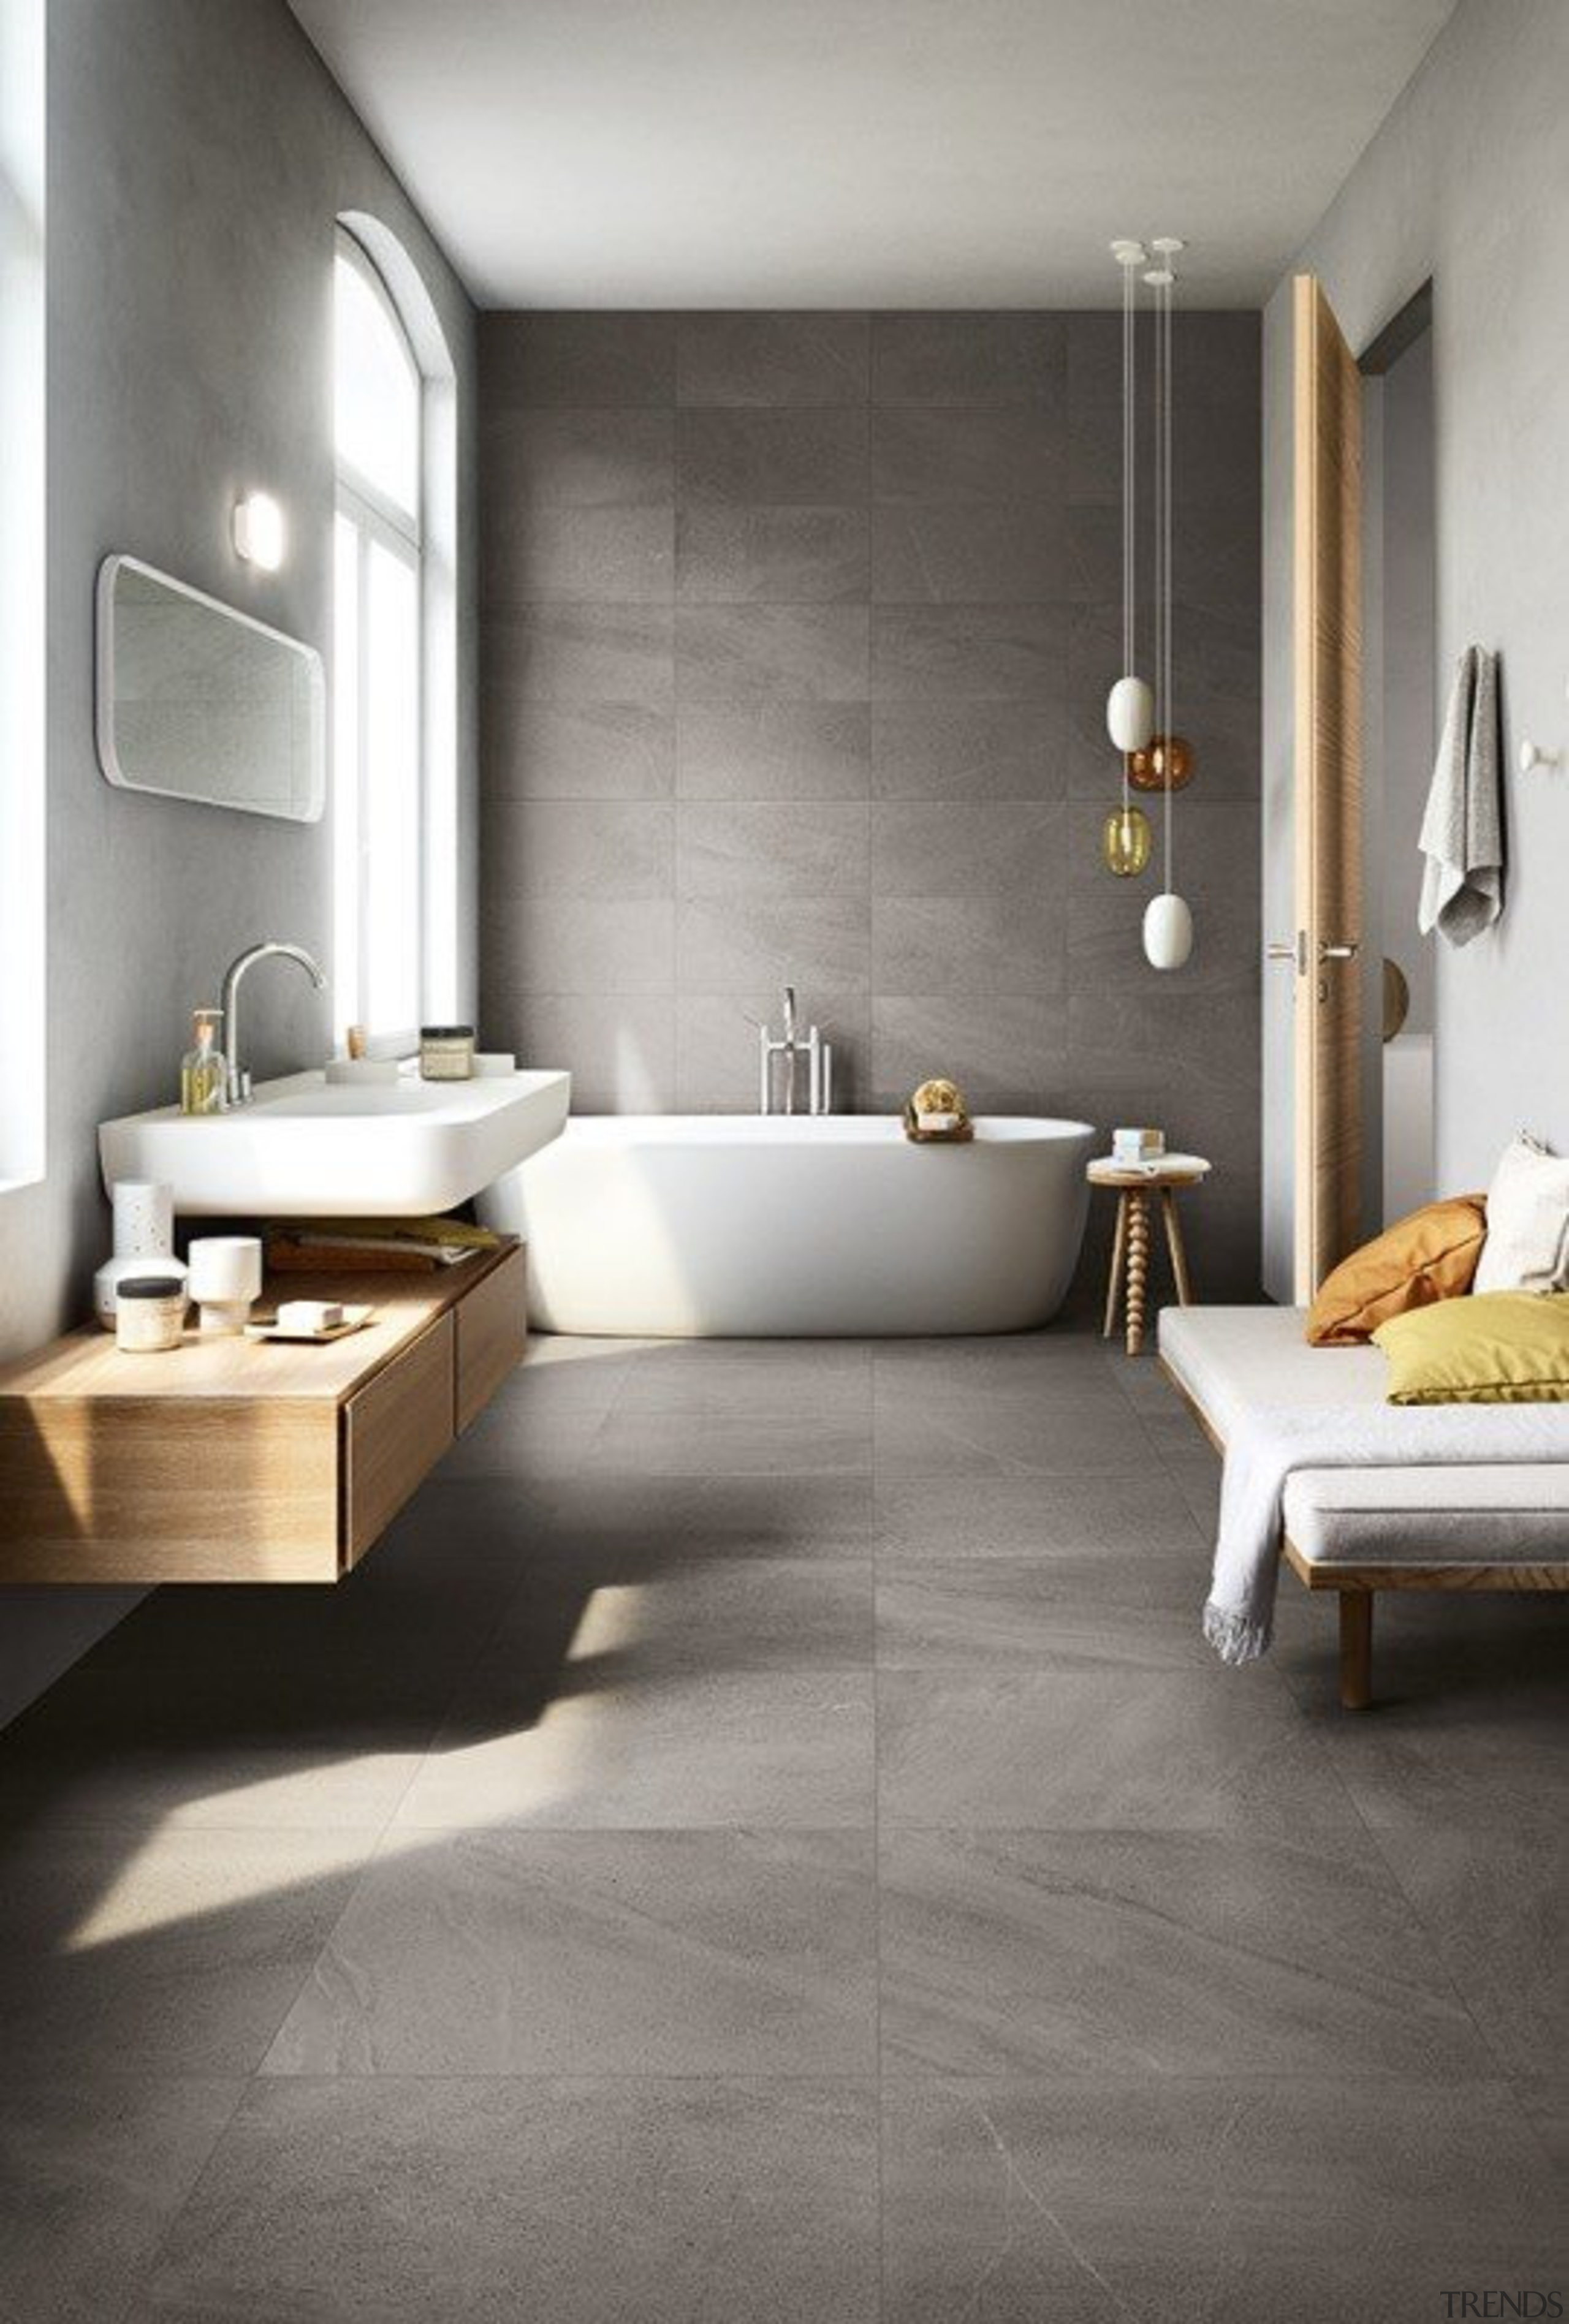 Limestone - bathroom | ceramic | floor | bathroom, ceramic, floor, flooring, interior design, laminate flooring, plumbing fixture, product design, room, sink, tap, tile, wall, wood flooring, gray